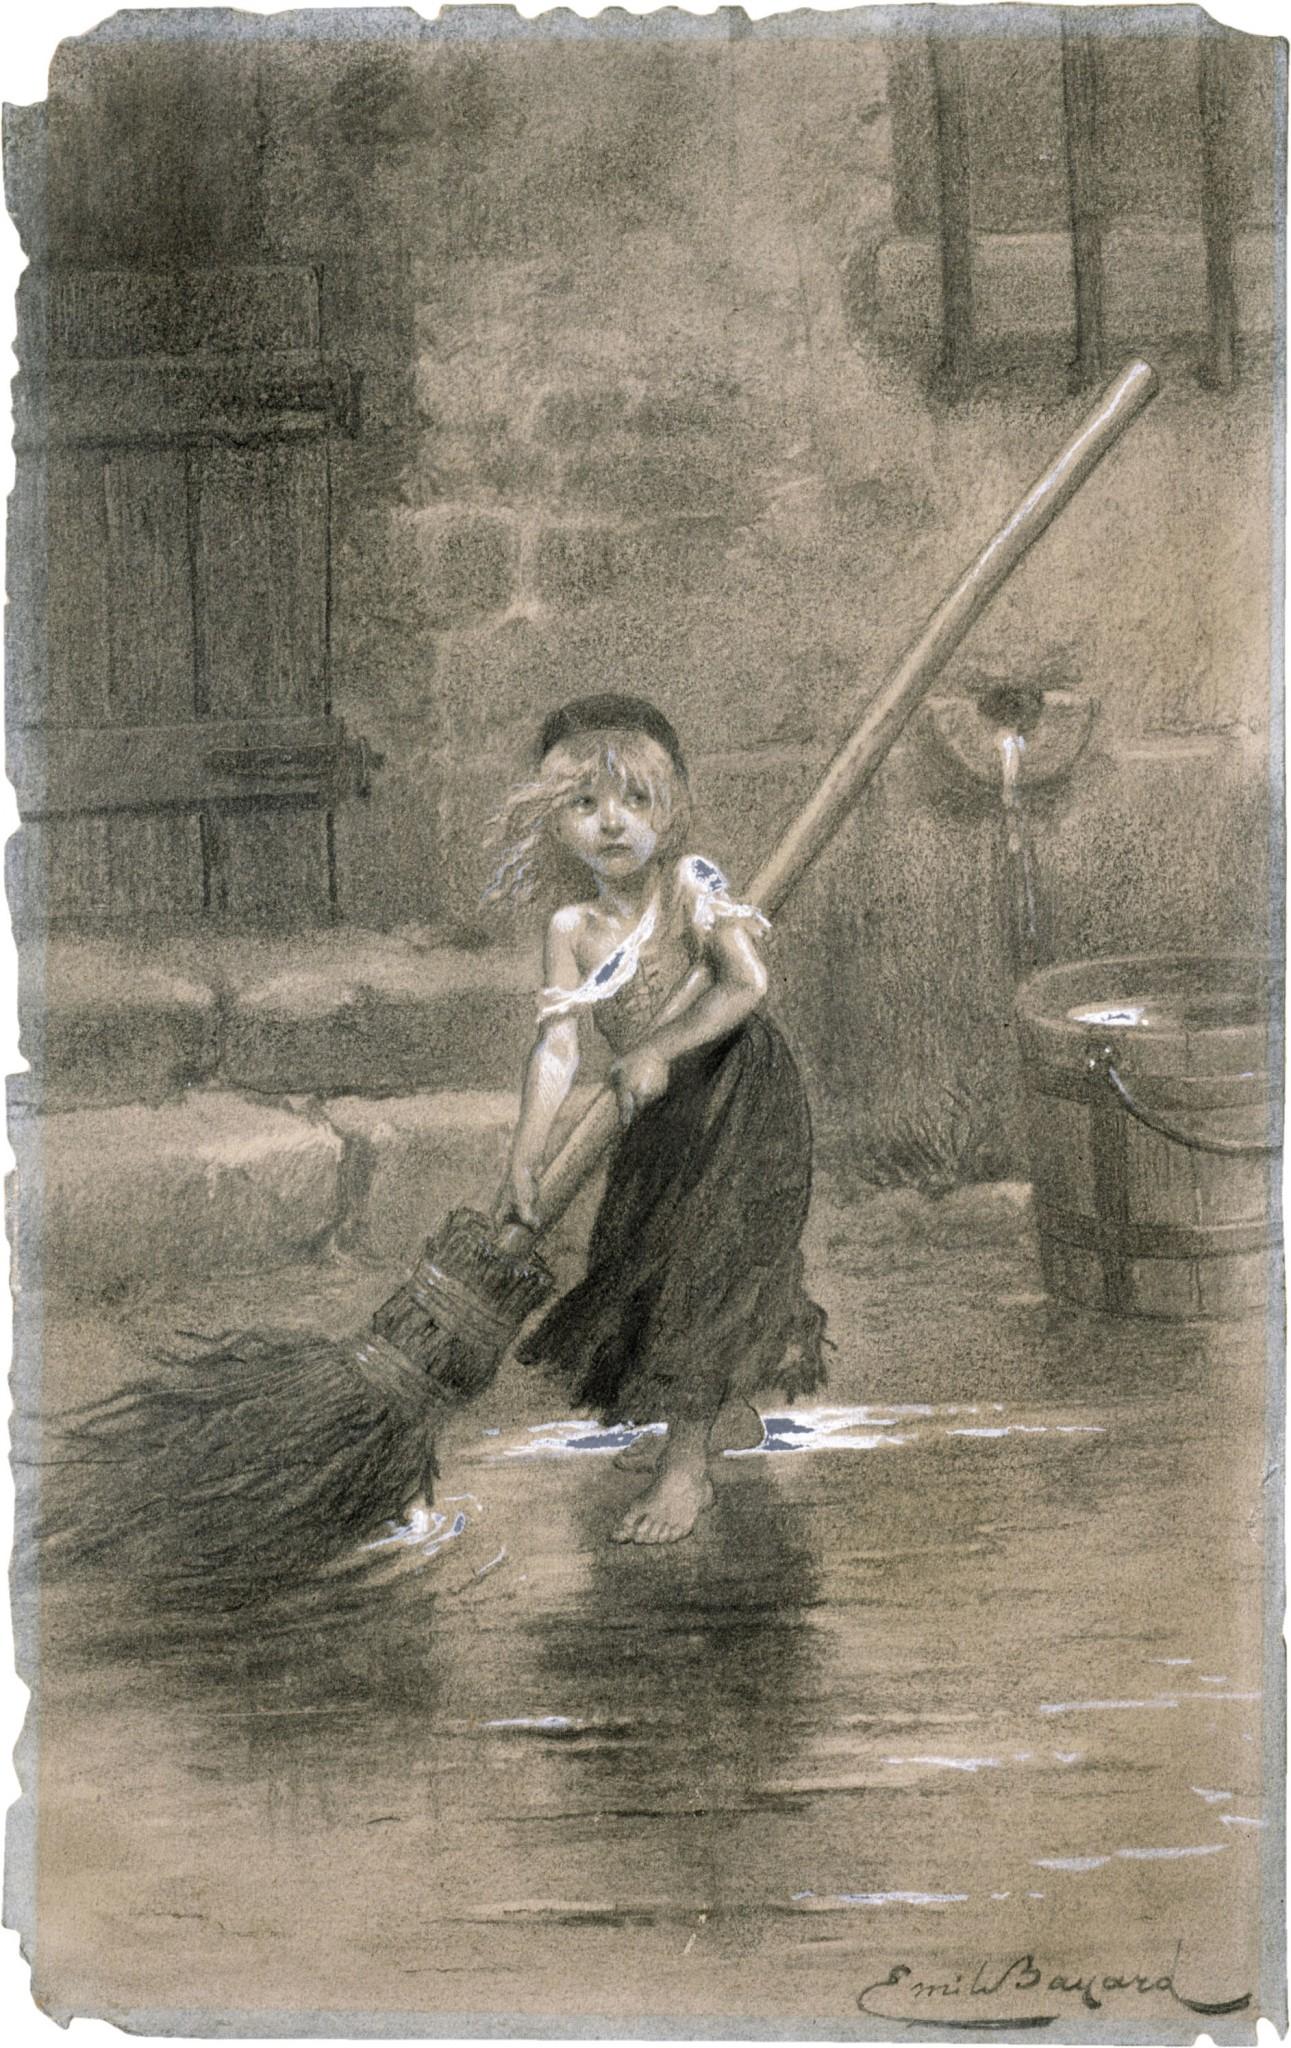 Cosette-sweeping-les-miserables-emile-bayard-1862